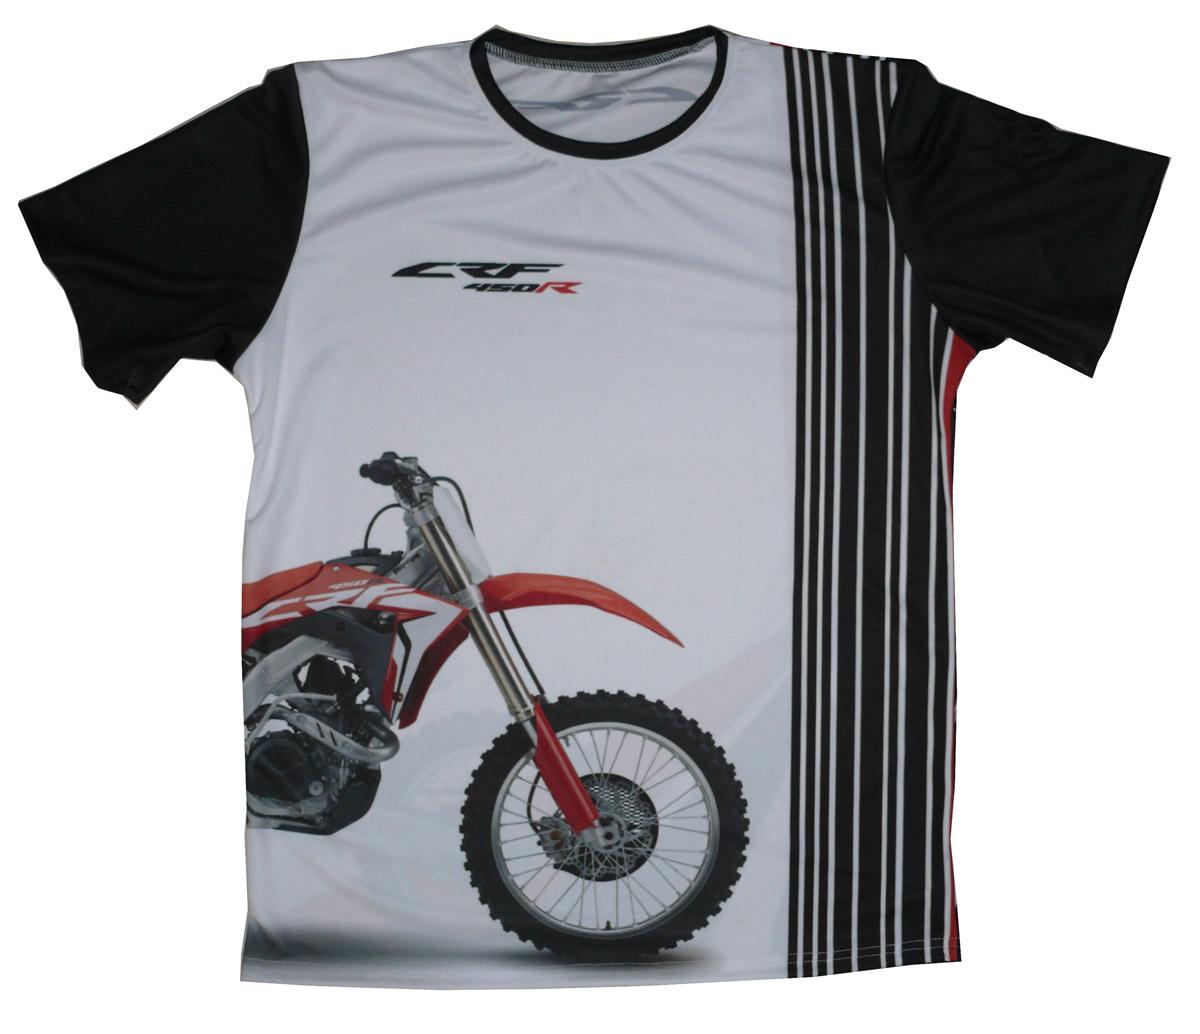 Honda CRF 450R 2019 cross bike bike maglietta